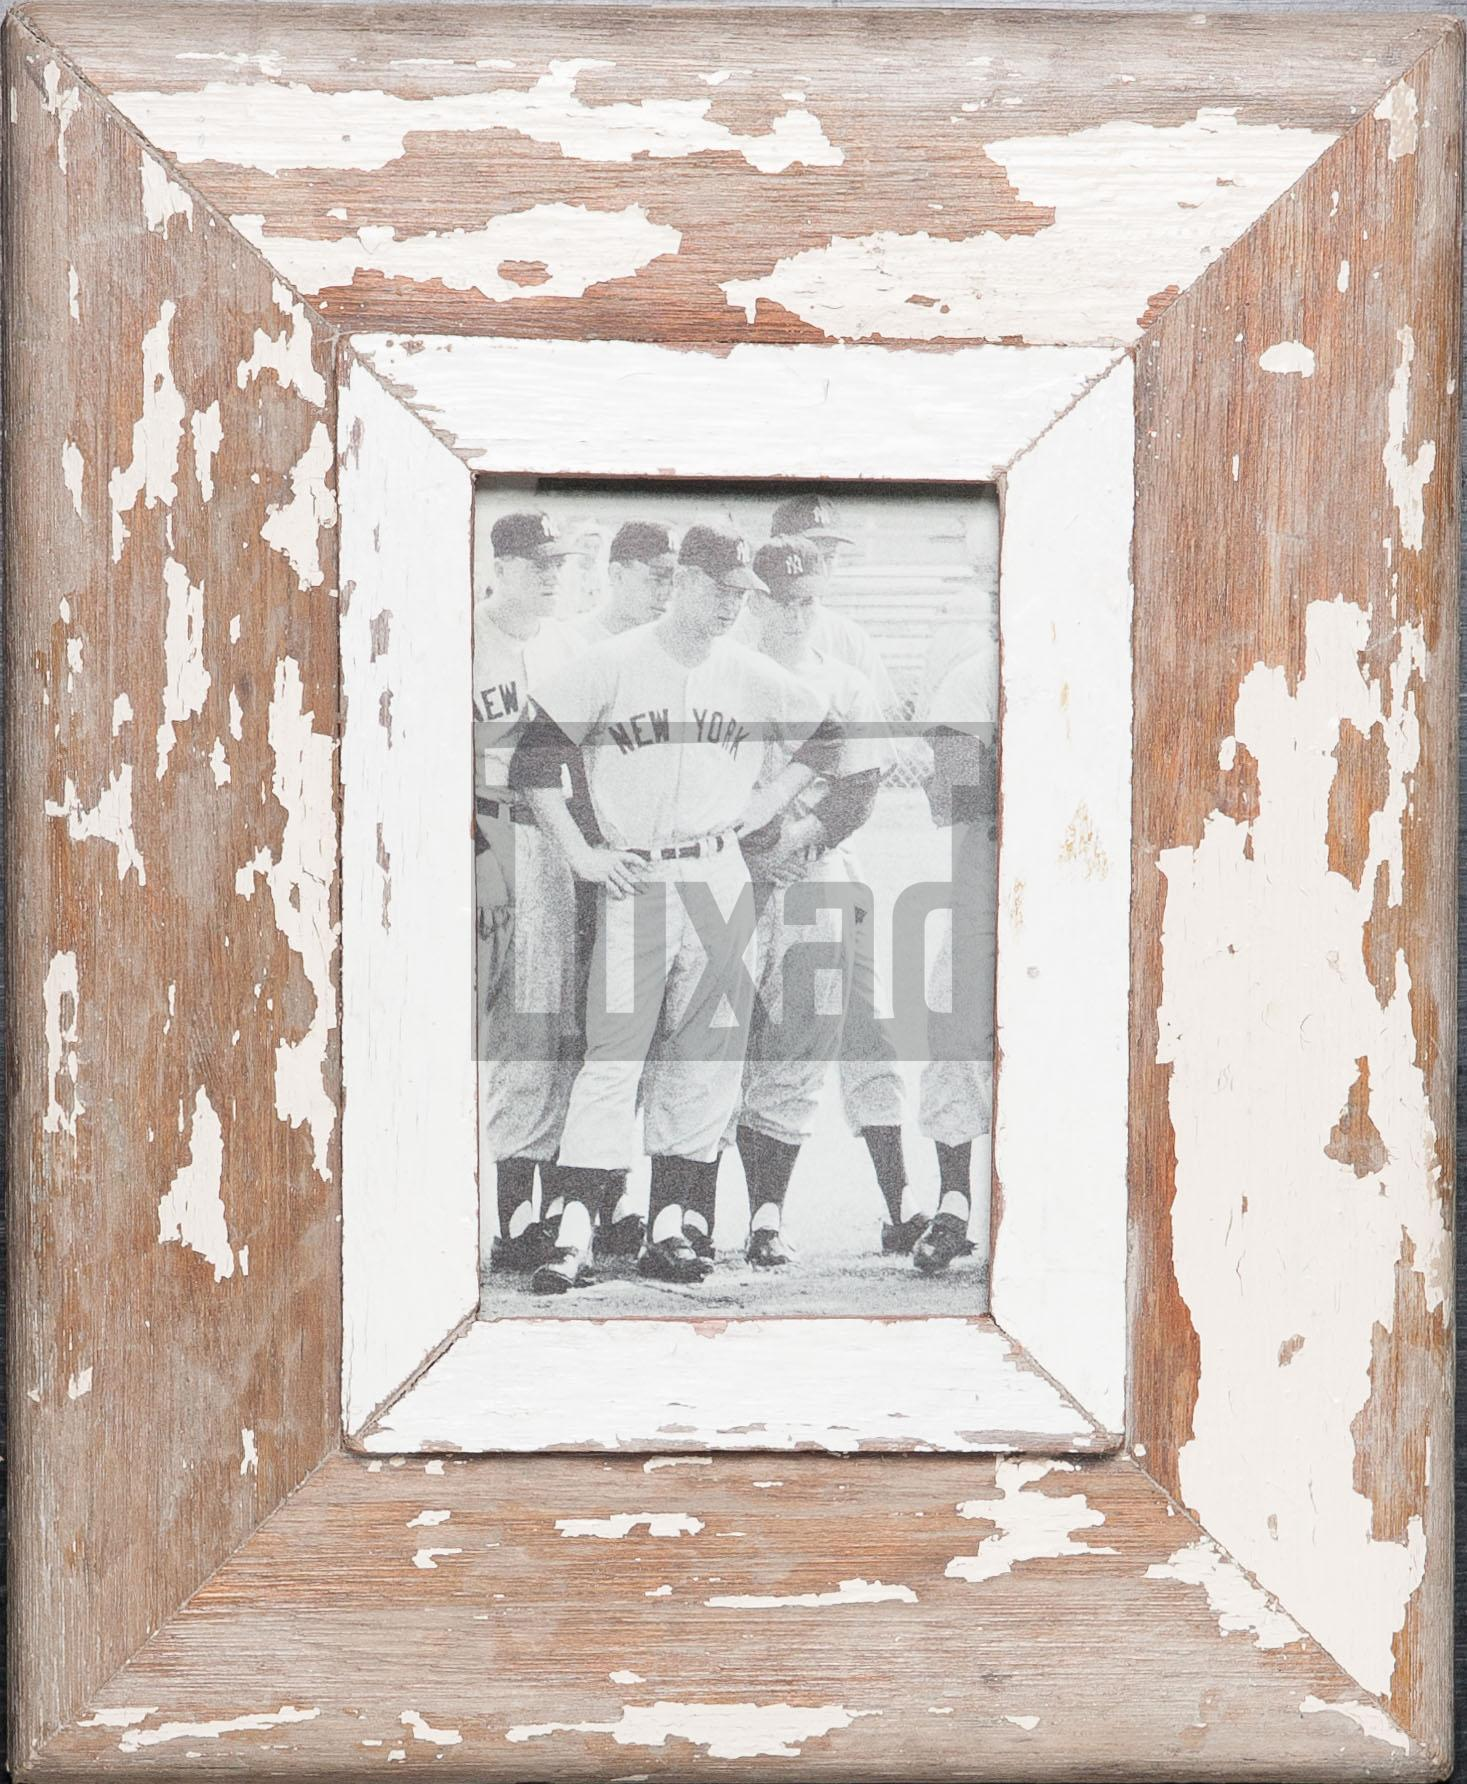 Vintage-Fotorahmen aus recyceltem Holz für ca. 10,5 x 14,8 cm